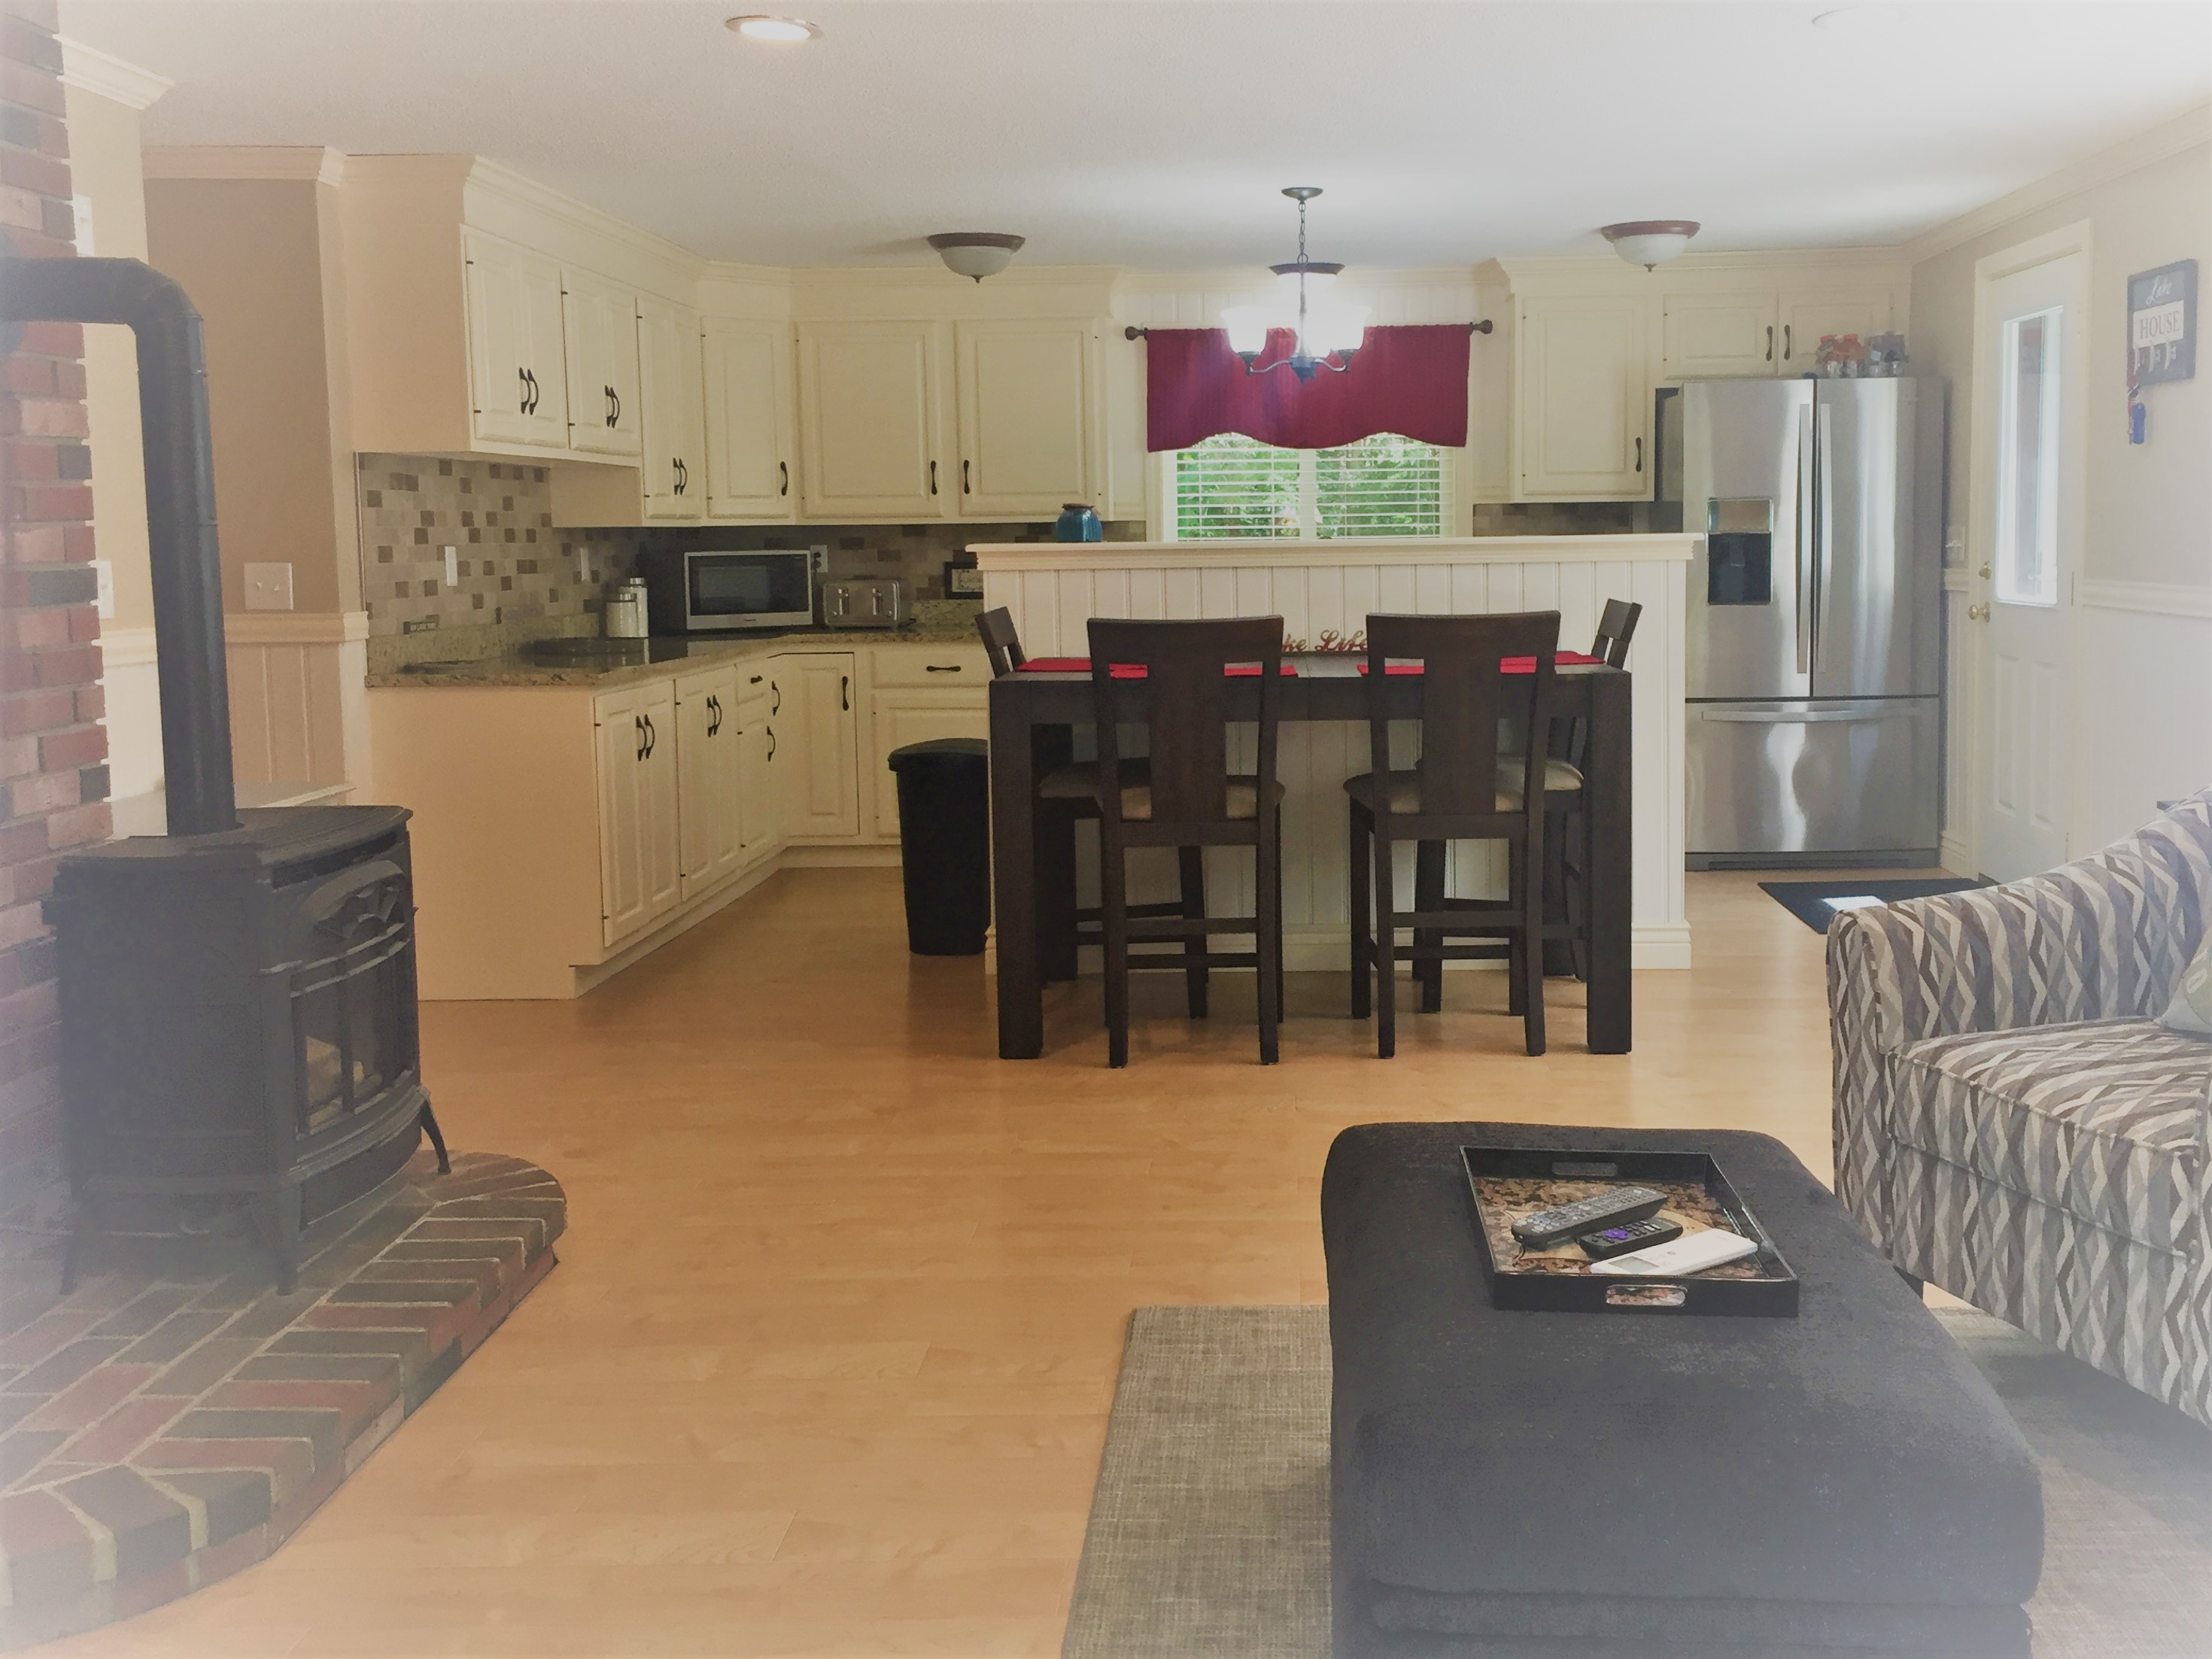 Kitchen, dining, sitting area